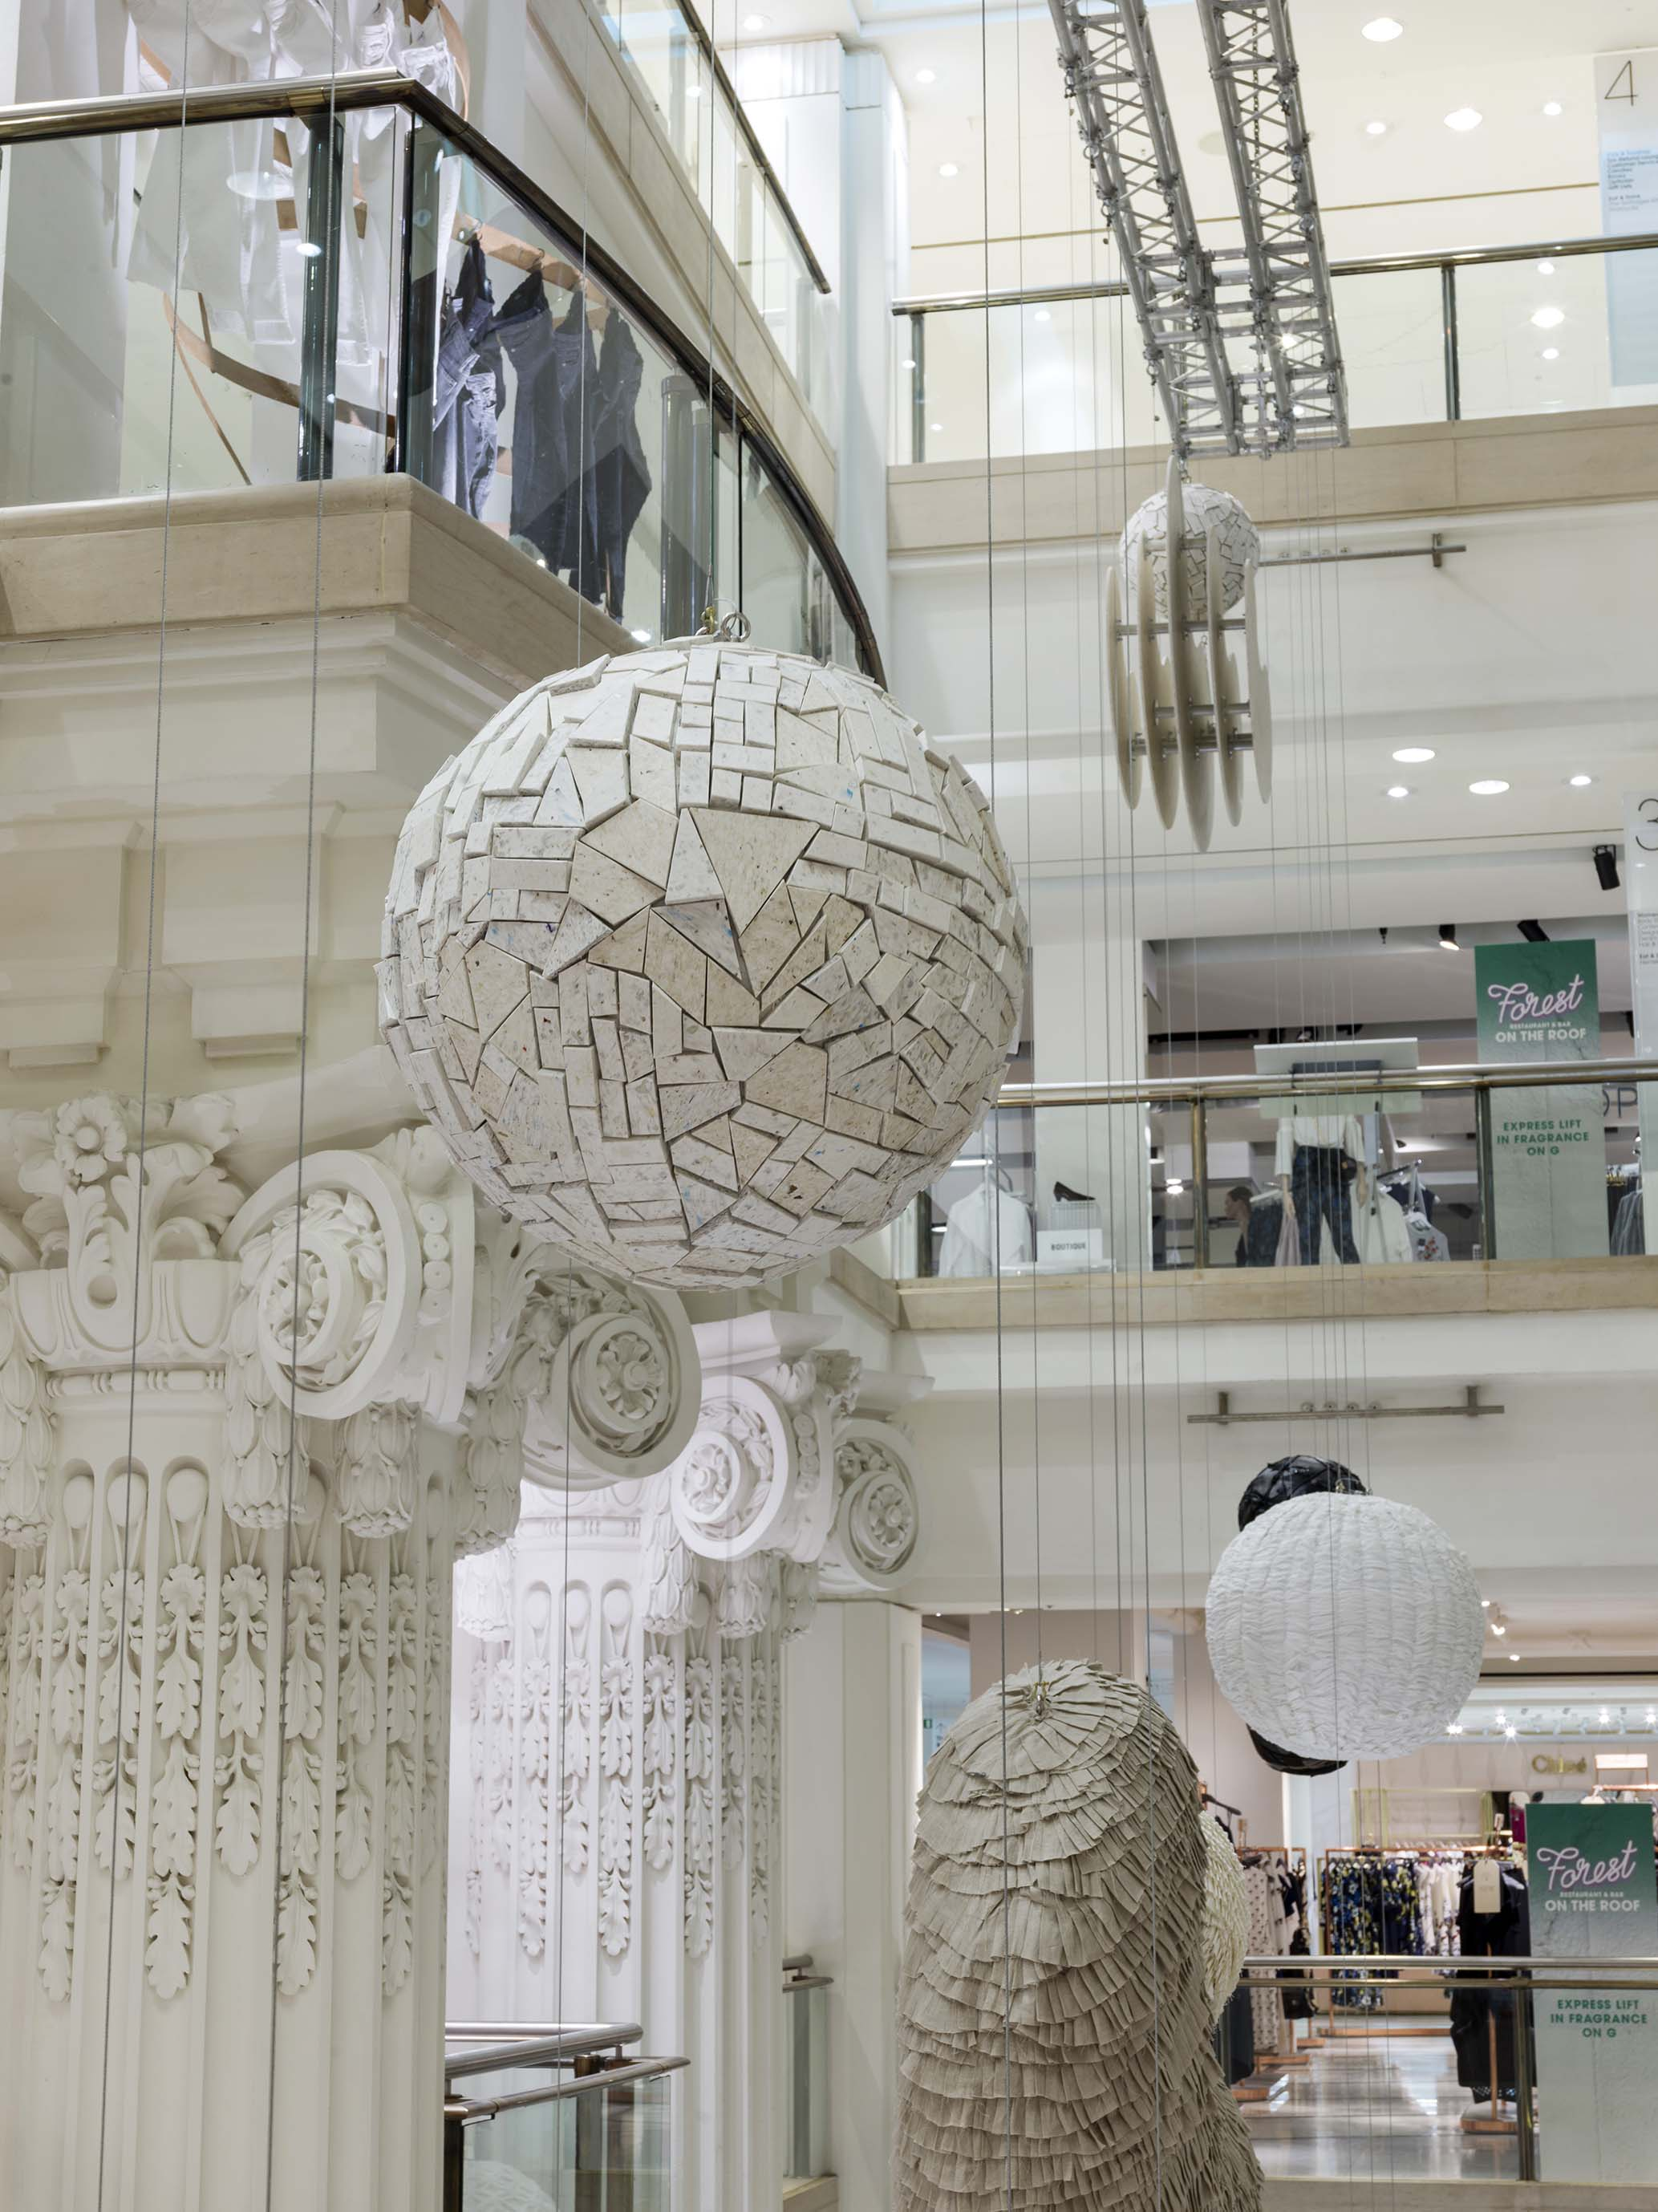 Smile Plastics'  Yogurt Material , seen at Selfridges' Material World project